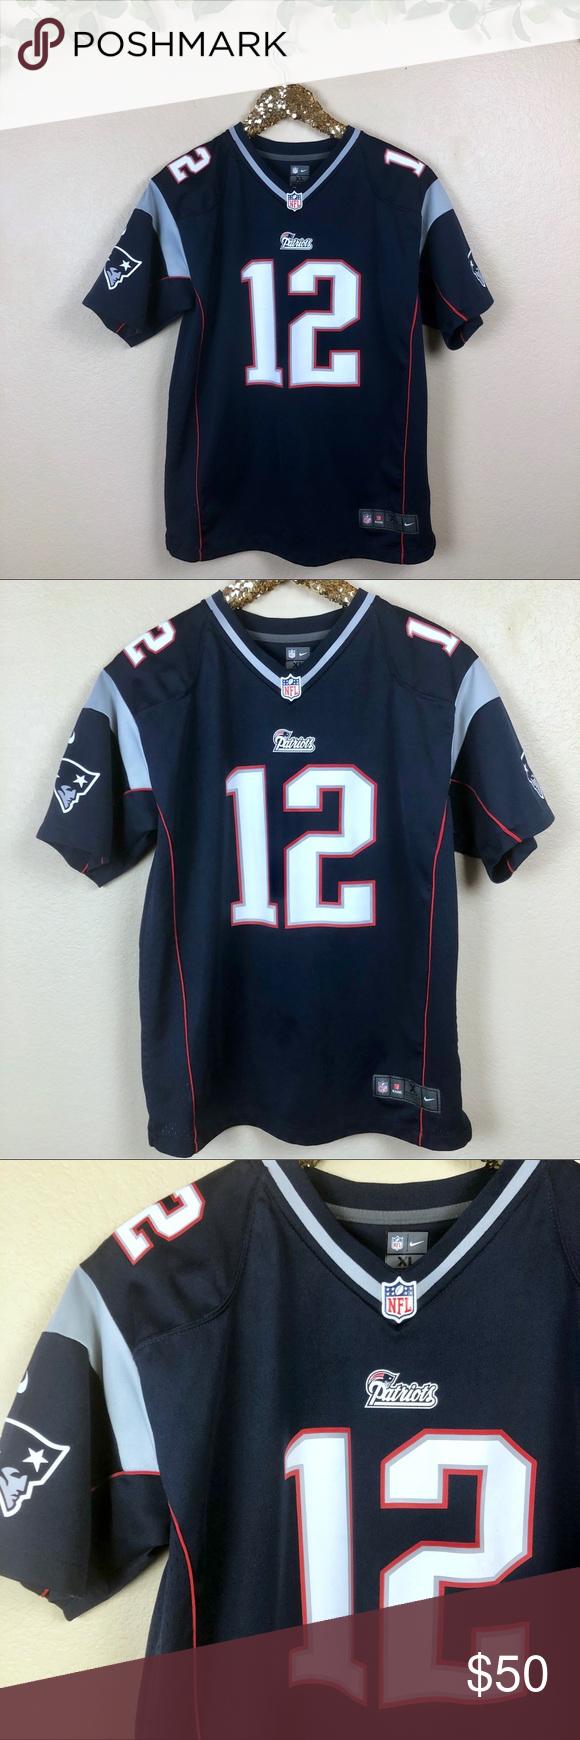 Nike Women S Tom Brady Patriots Jersey From Nike Women S Tom Brady New England Patriots Jersey Details Women S Nike Game Jerse My Posh Closet In 2019